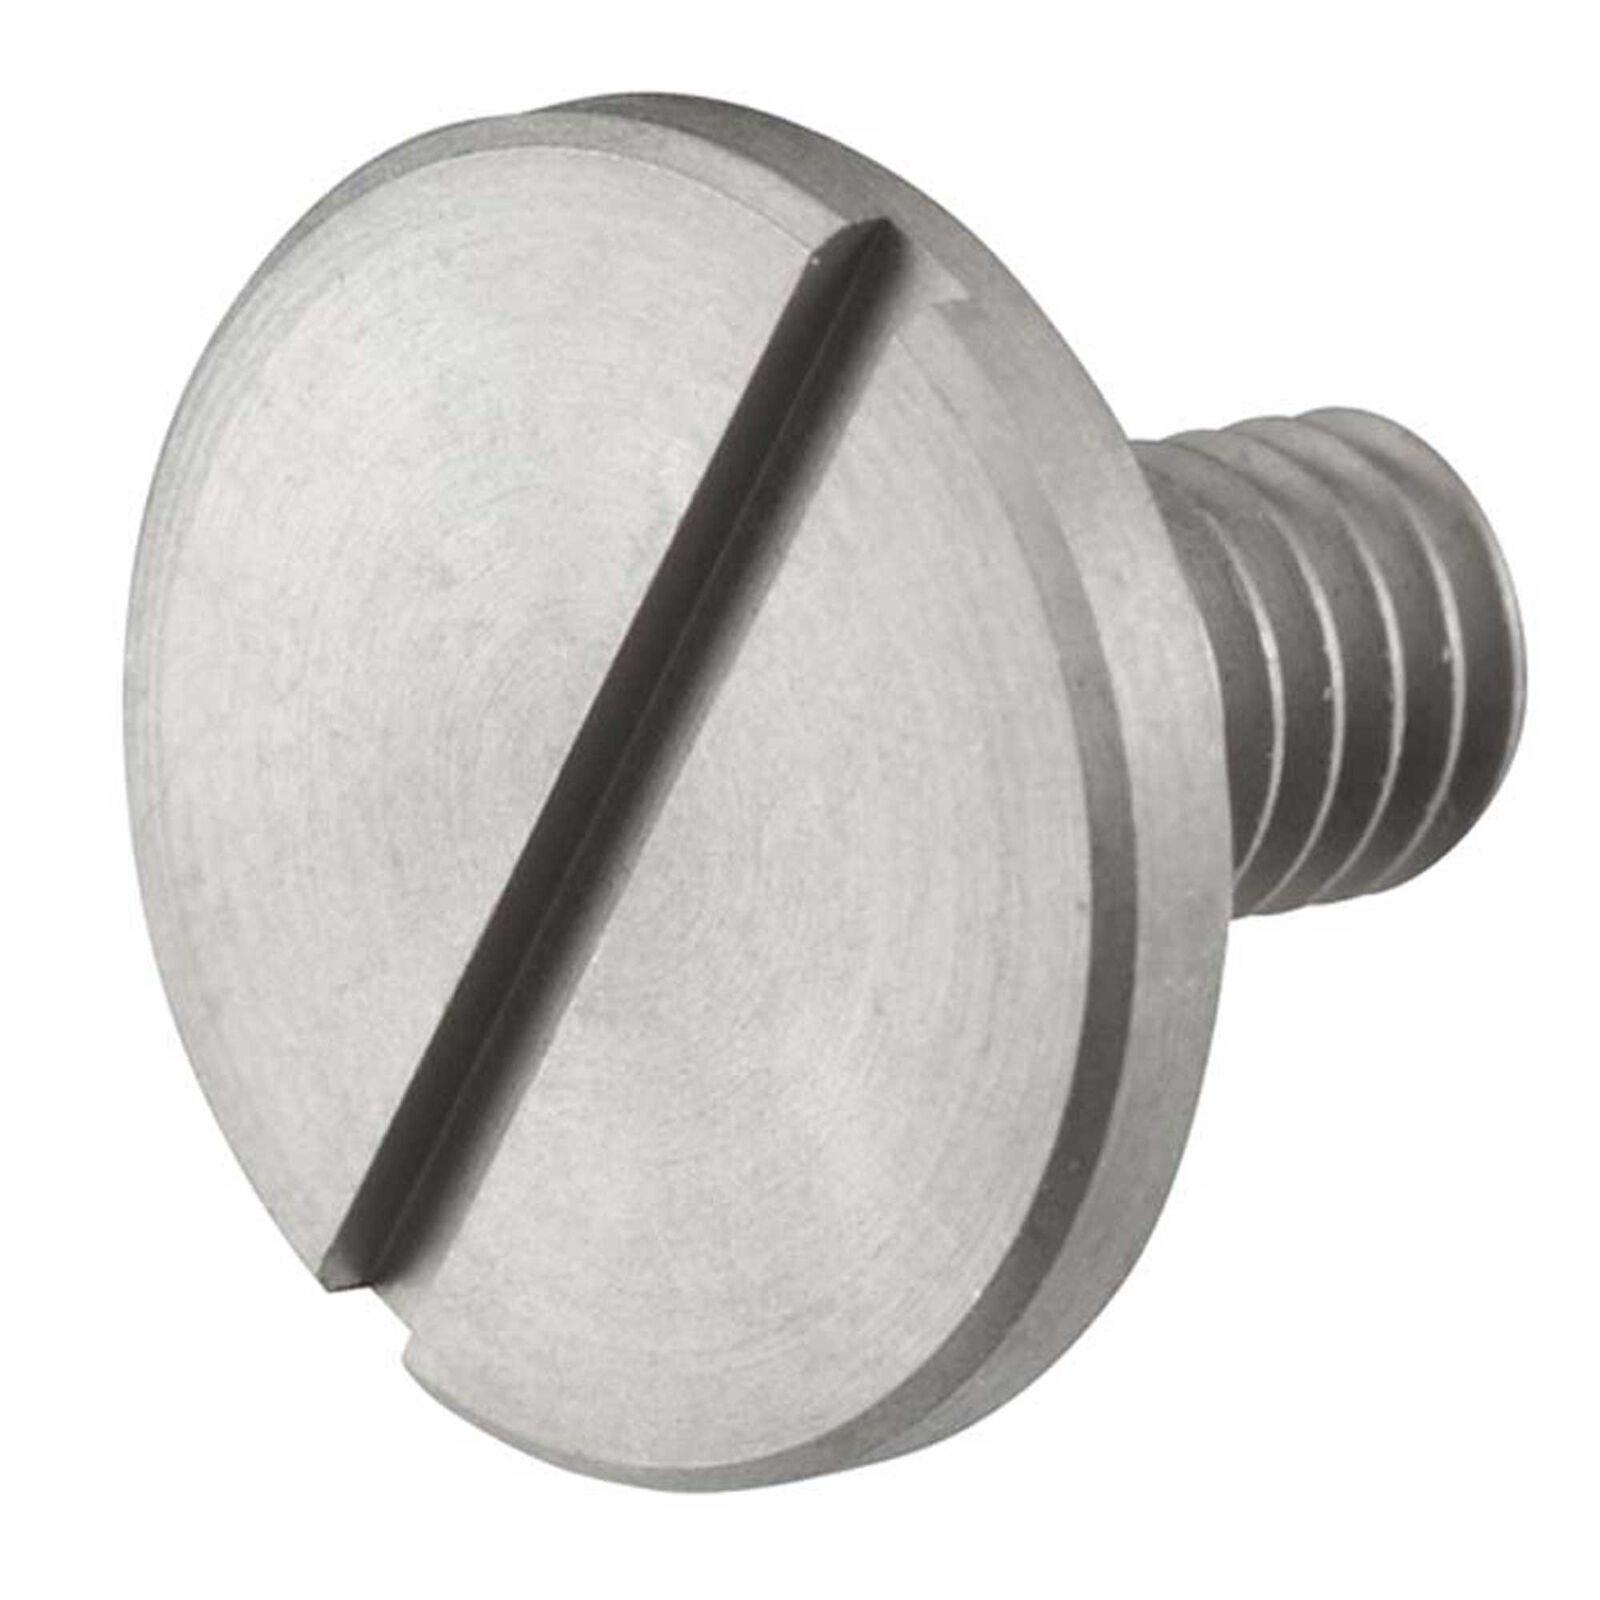 Crank Pin Stop Screw: GT22